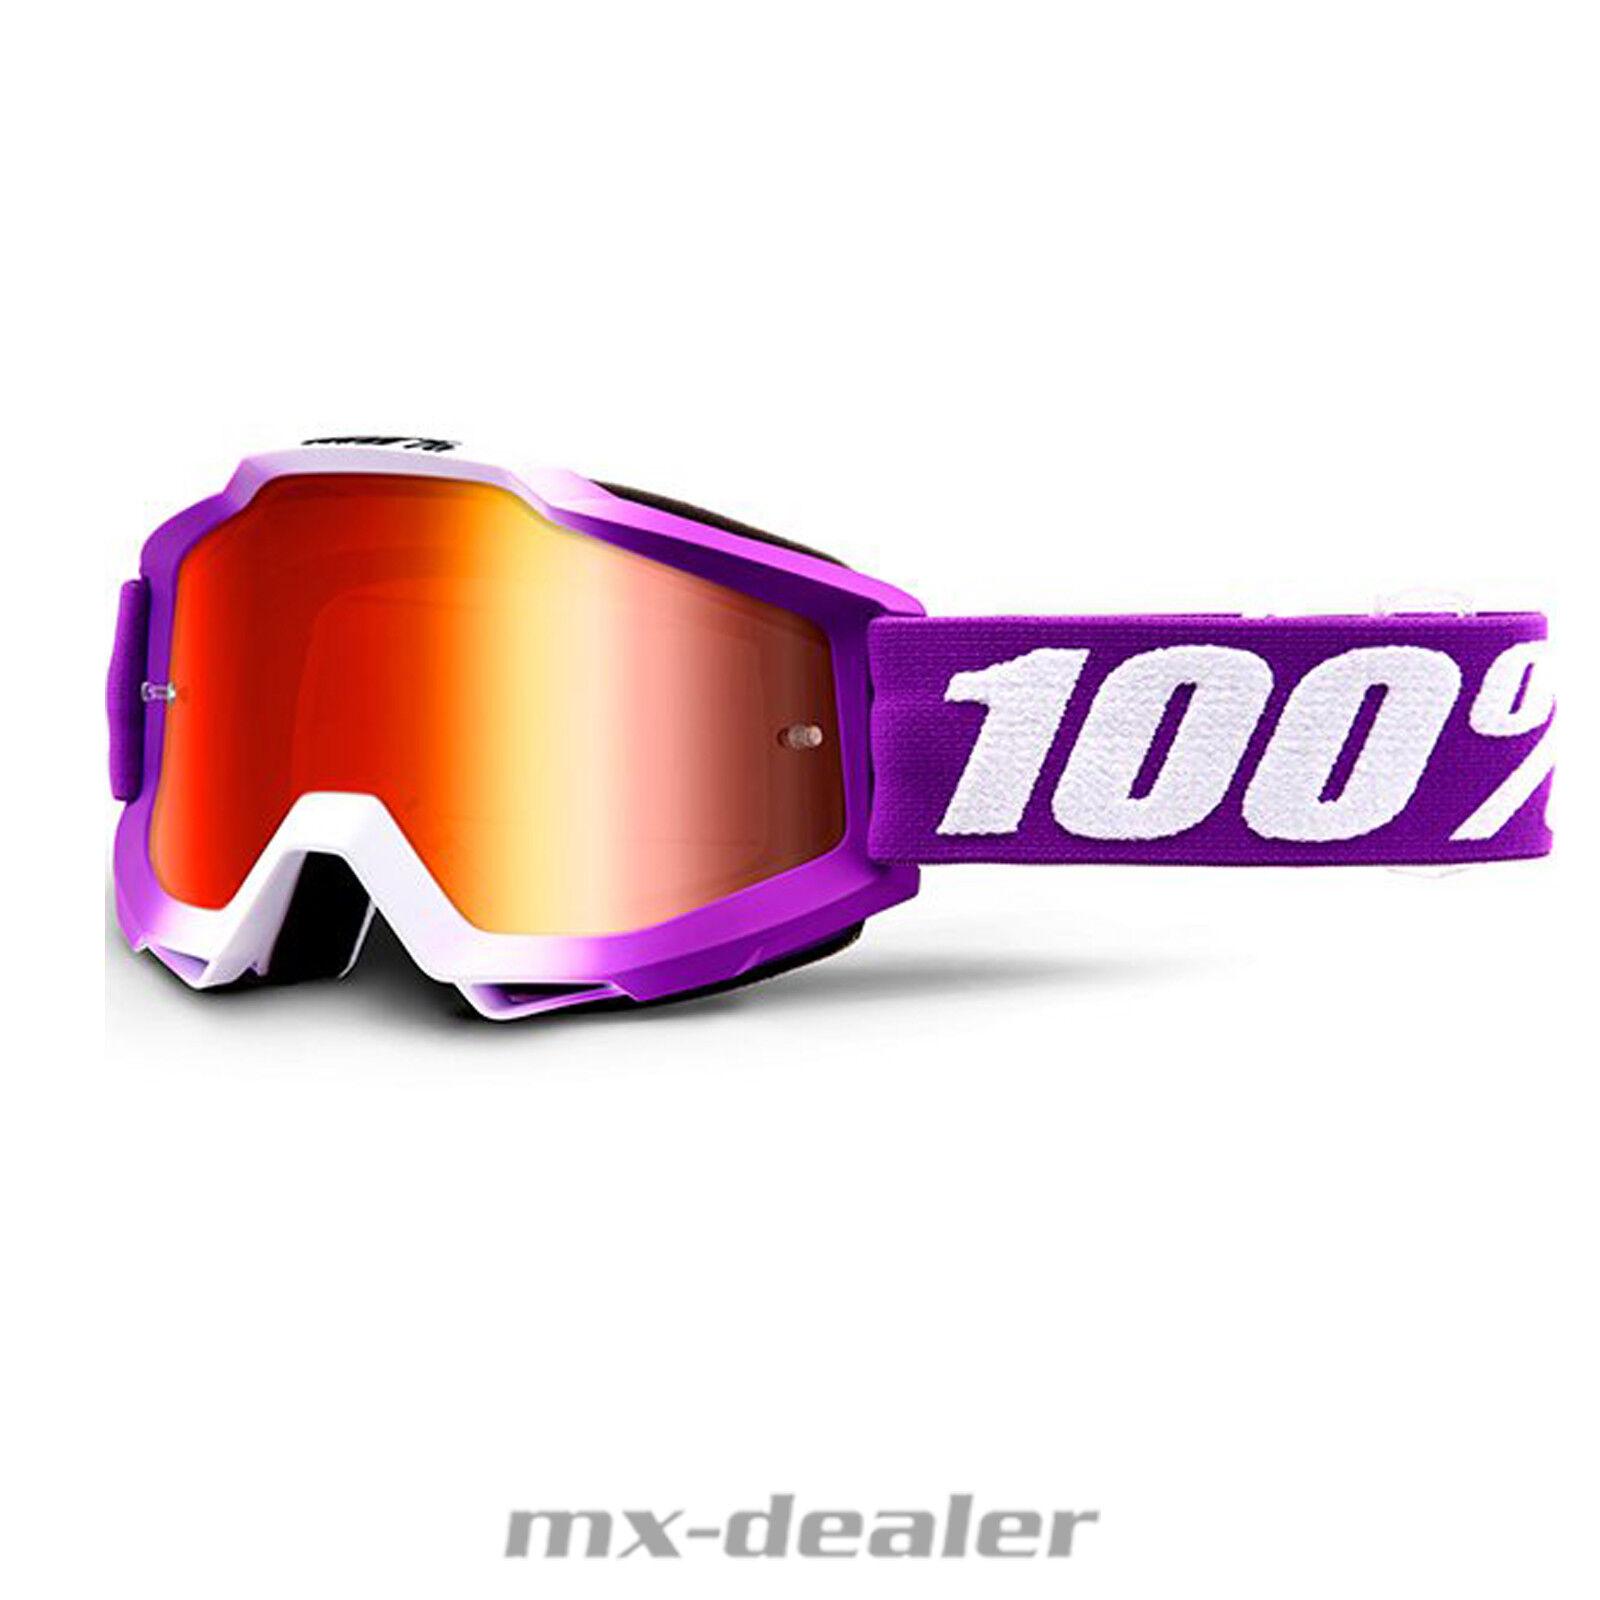 2019 100 % Prozent Accuri Framboise verspiegelt verspiegelt verspiegelt MX Motocross Crossbrille BMX MTB  | Sale Outlet  5f6465